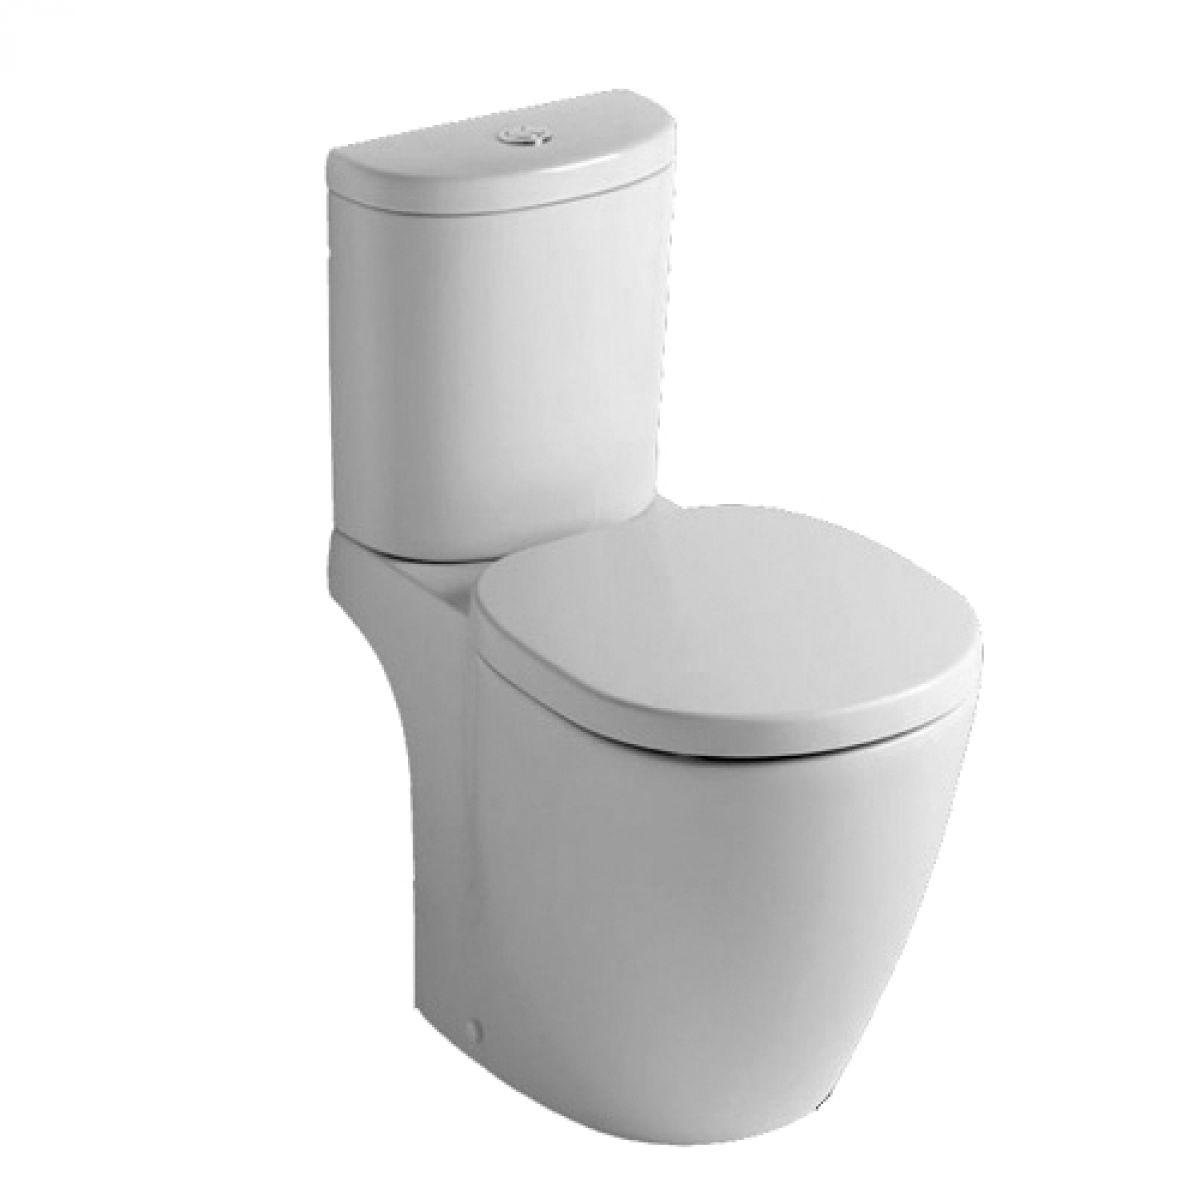 ideal standard concept arc standard close coupled toilet. Black Bedroom Furniture Sets. Home Design Ideas